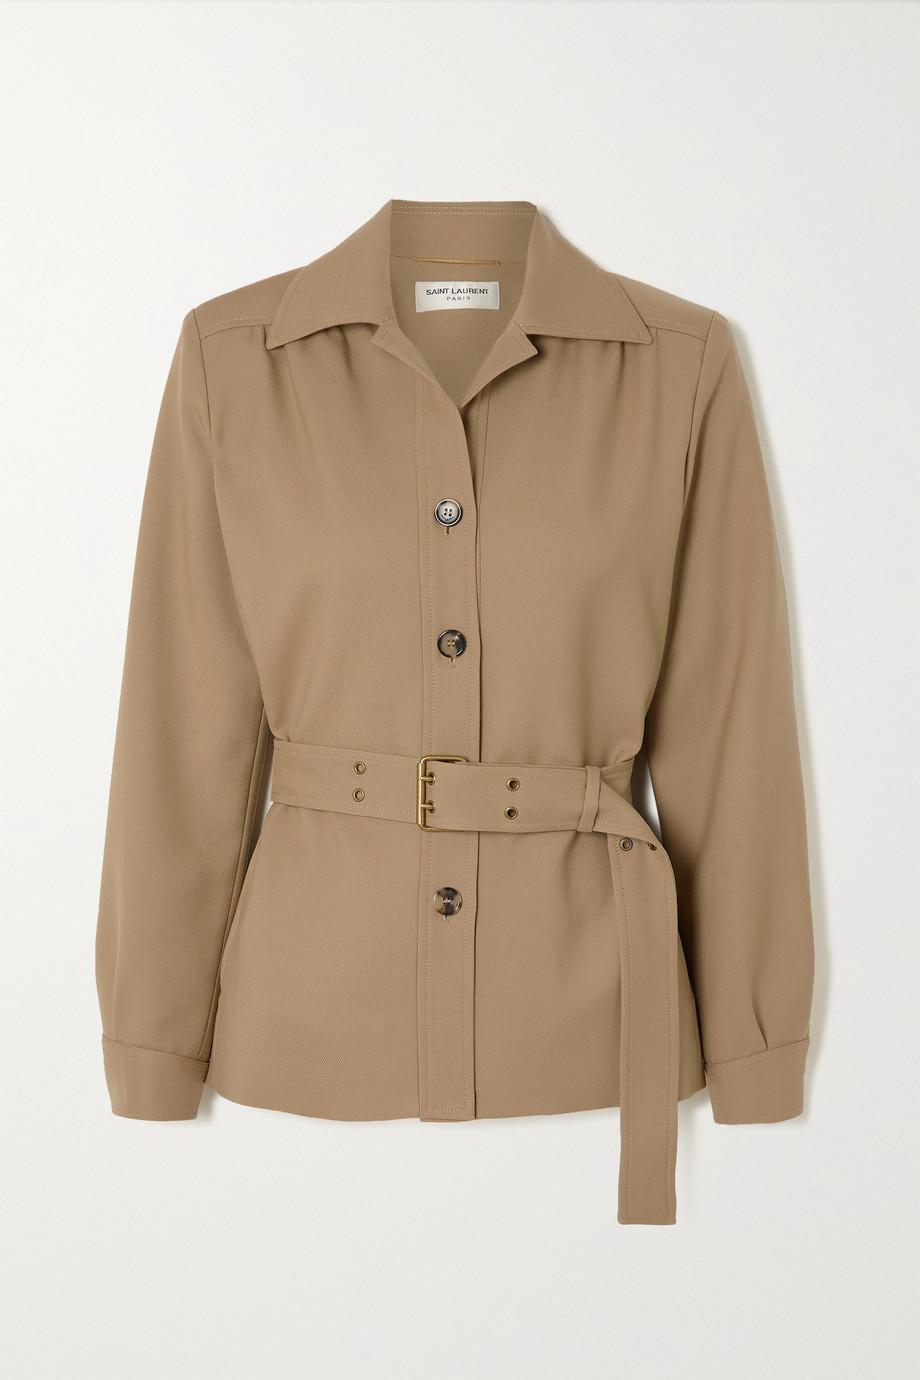 SAINT LAURENT Belted wool-twill jacket